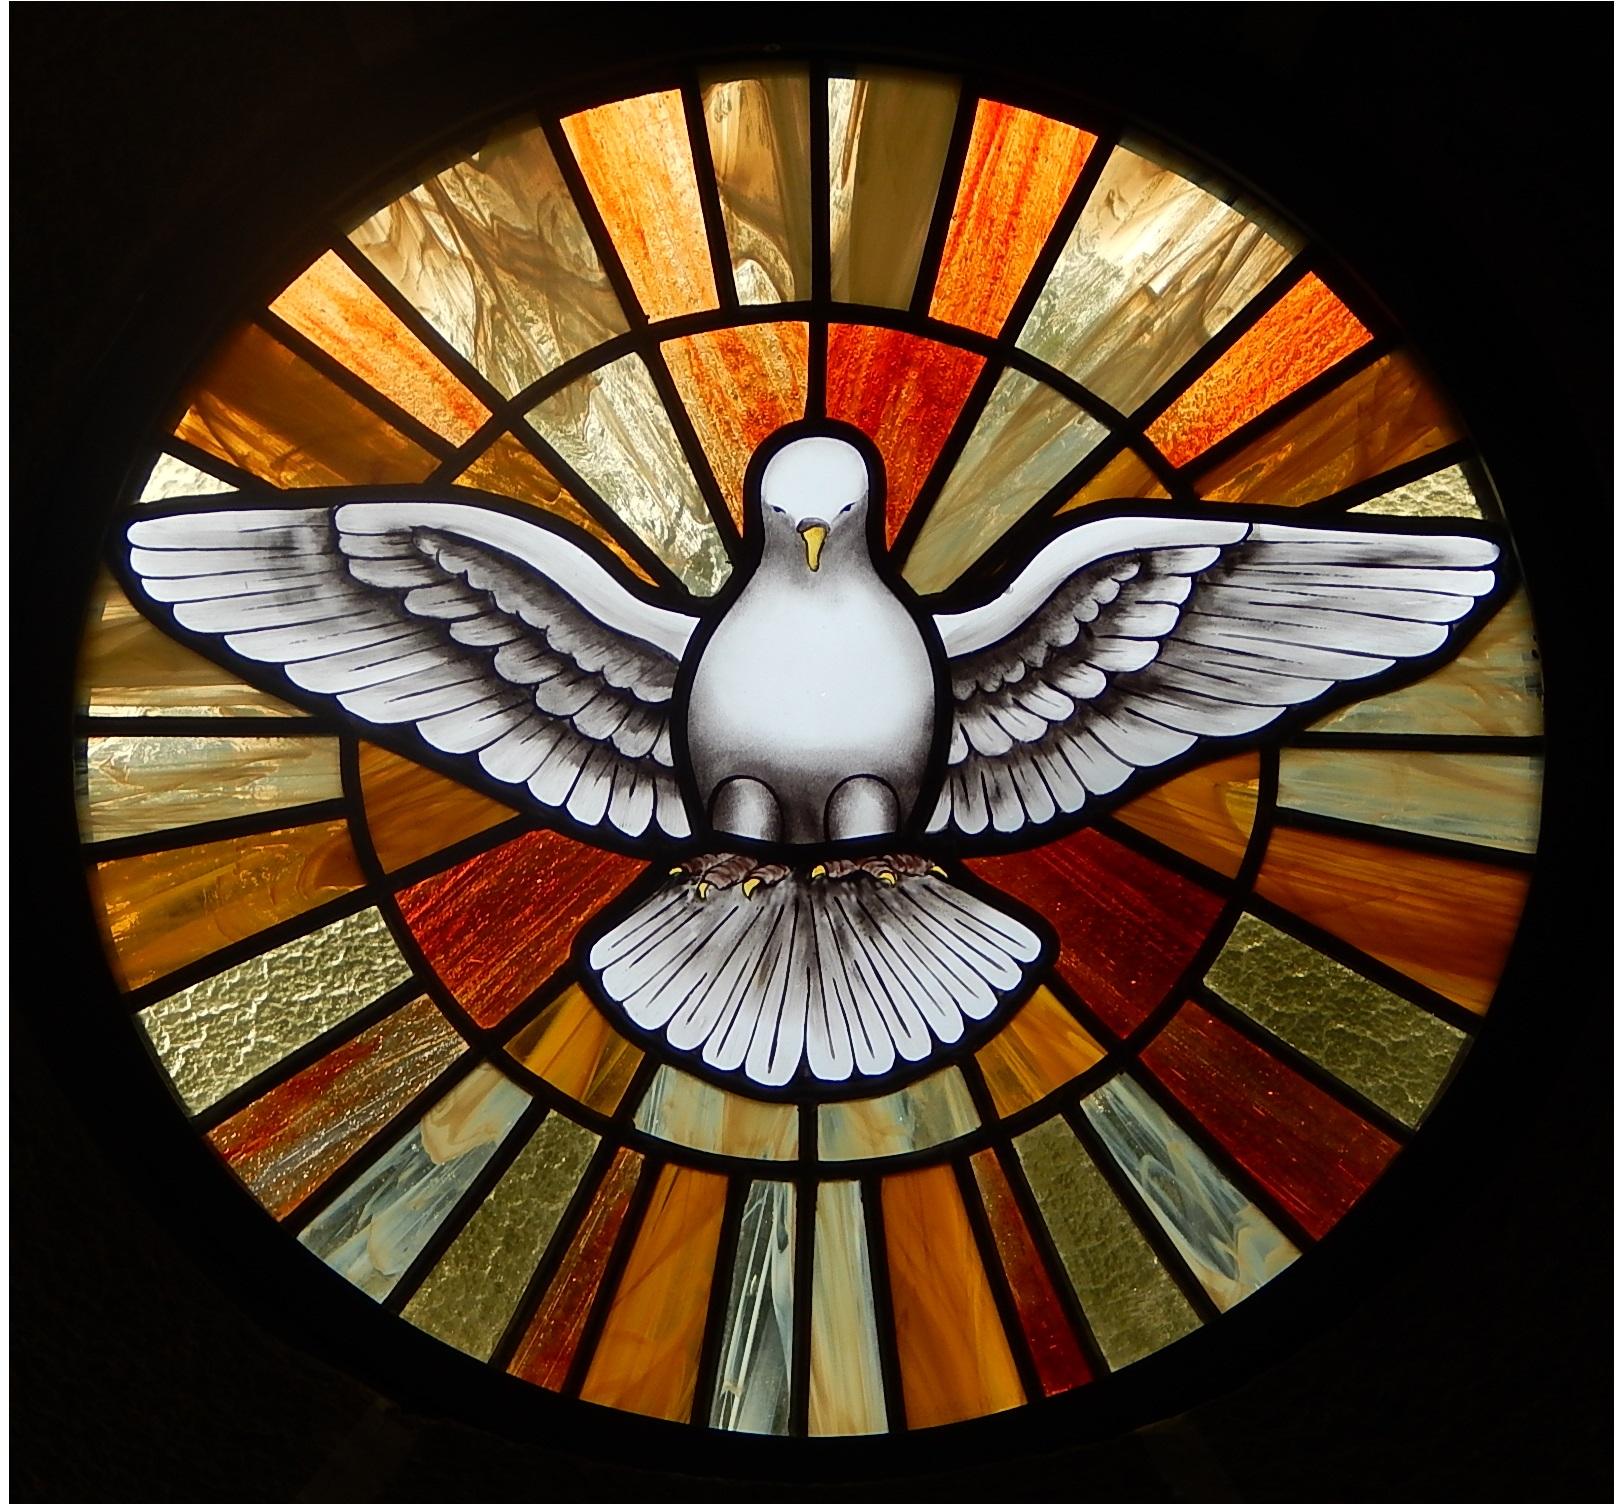 Vitral Espírito Santo